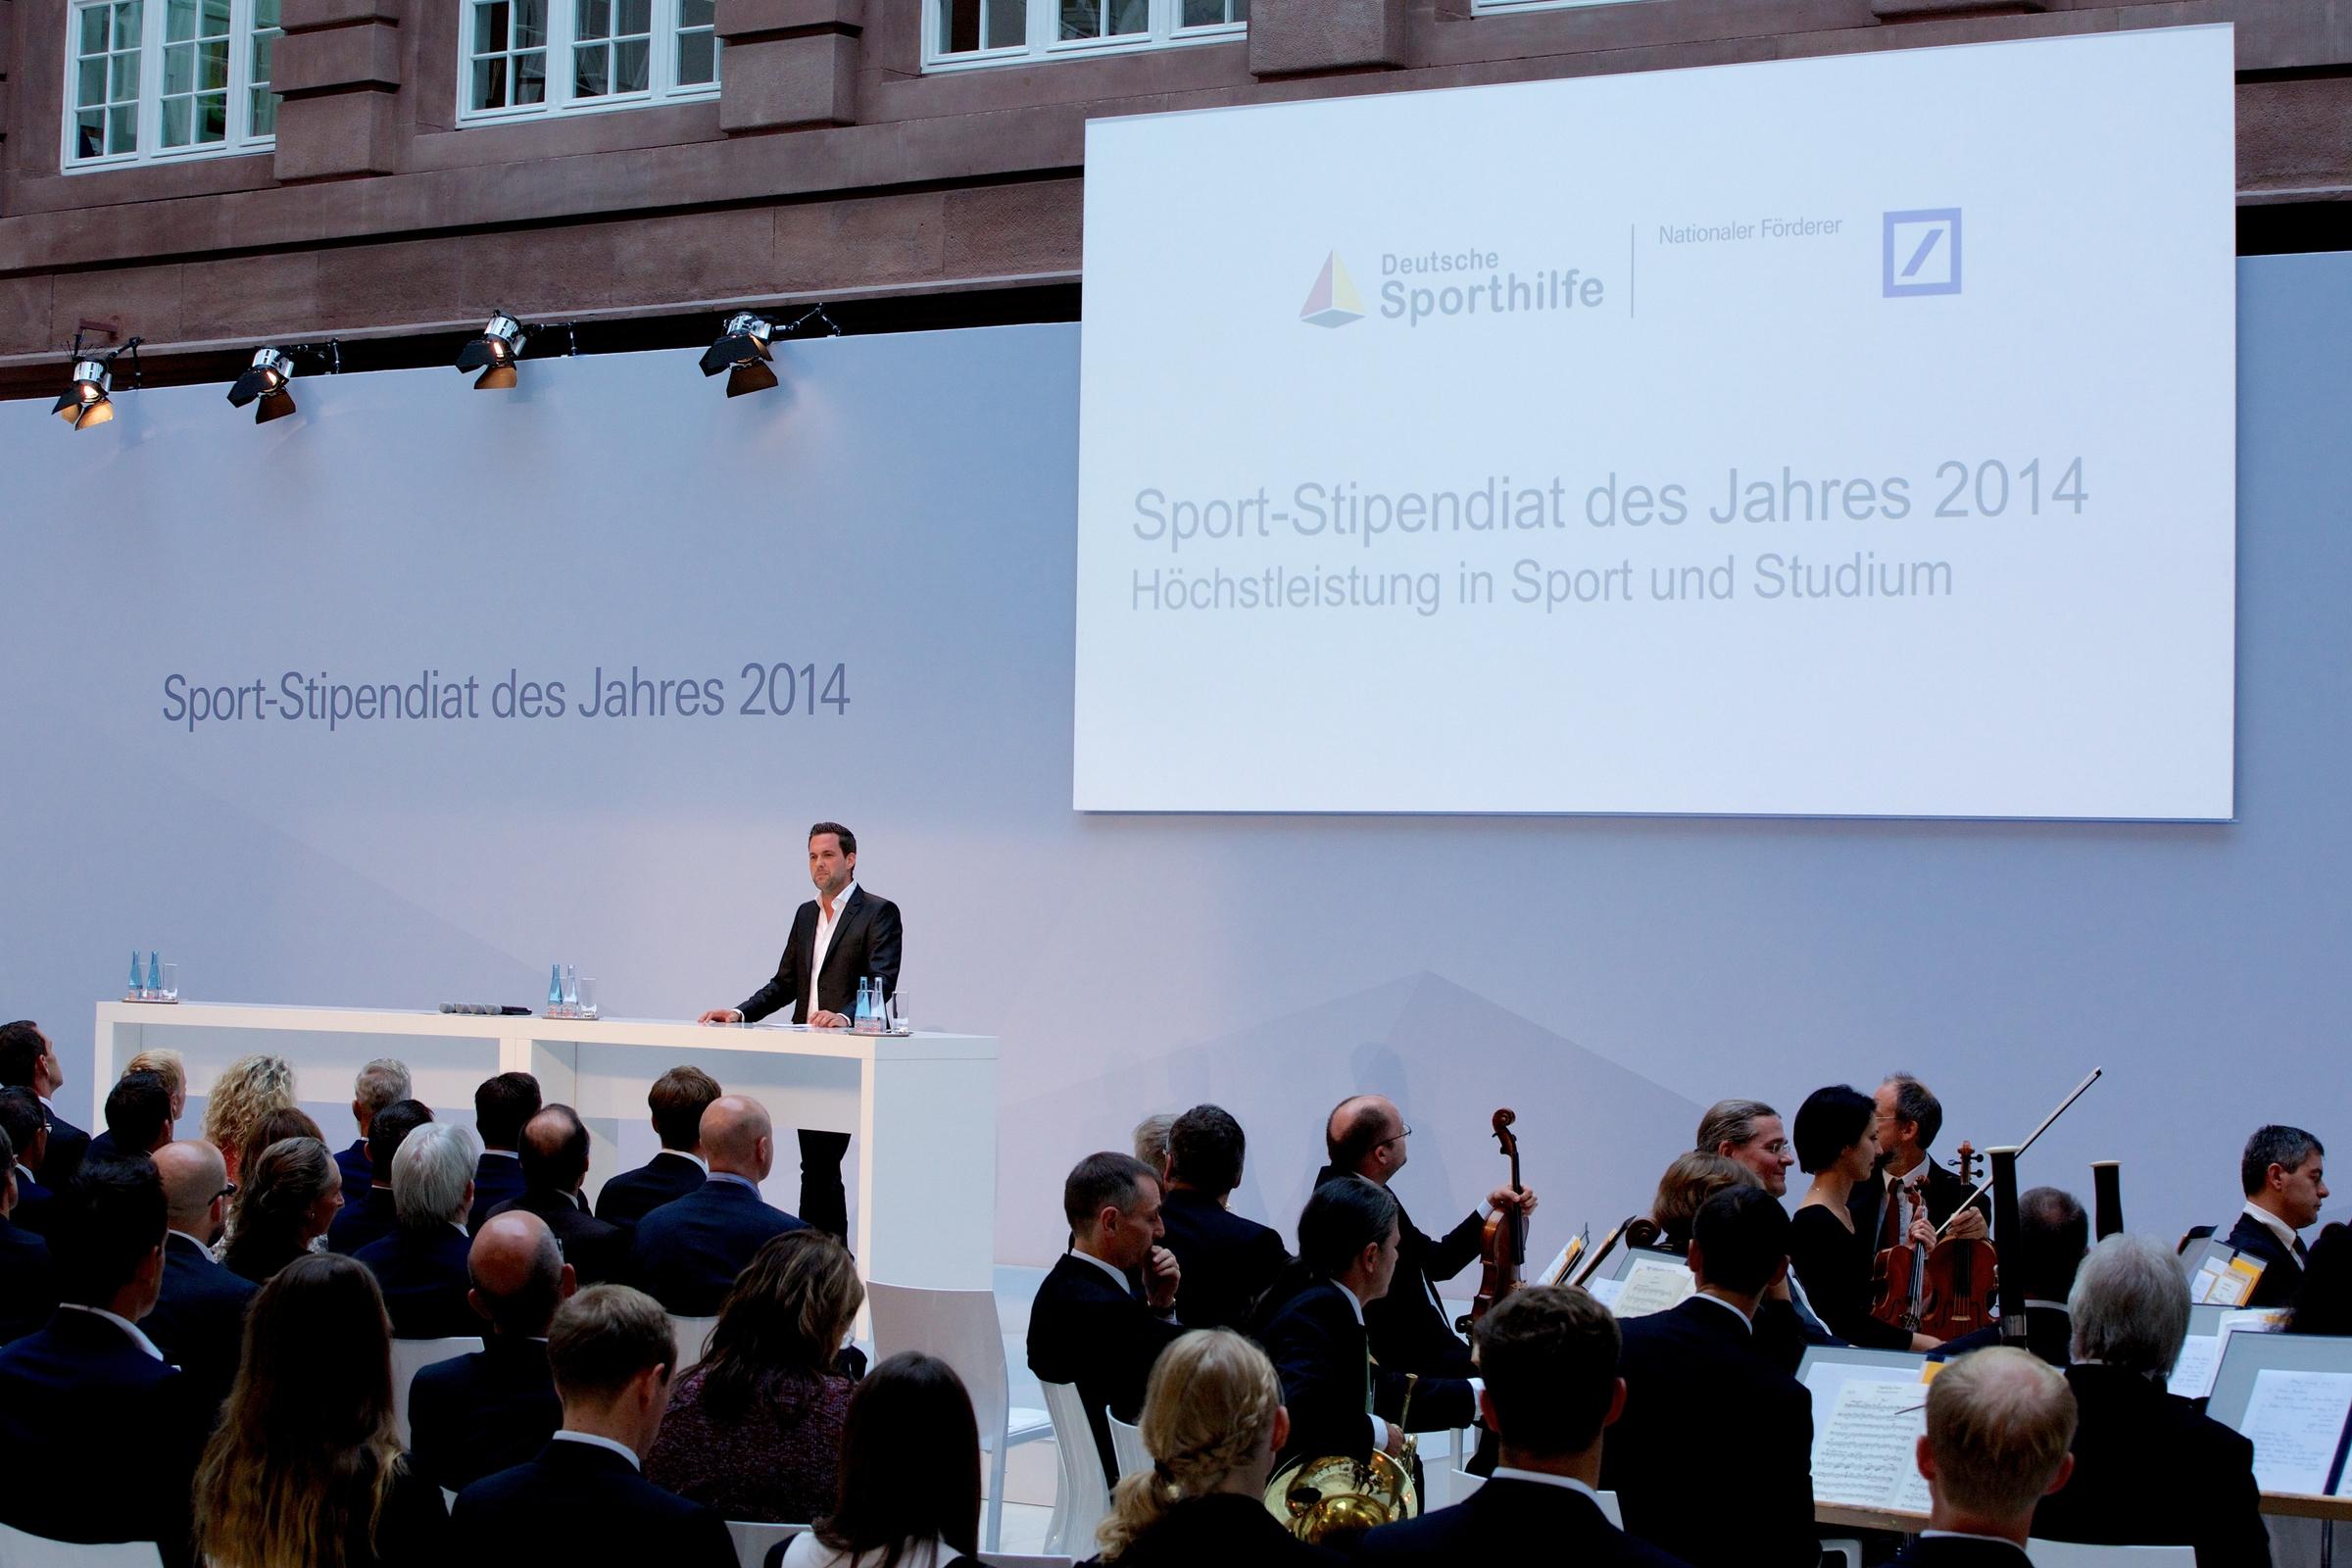 reitz-db-2014-sport-stipendiat-extra-006.jpg